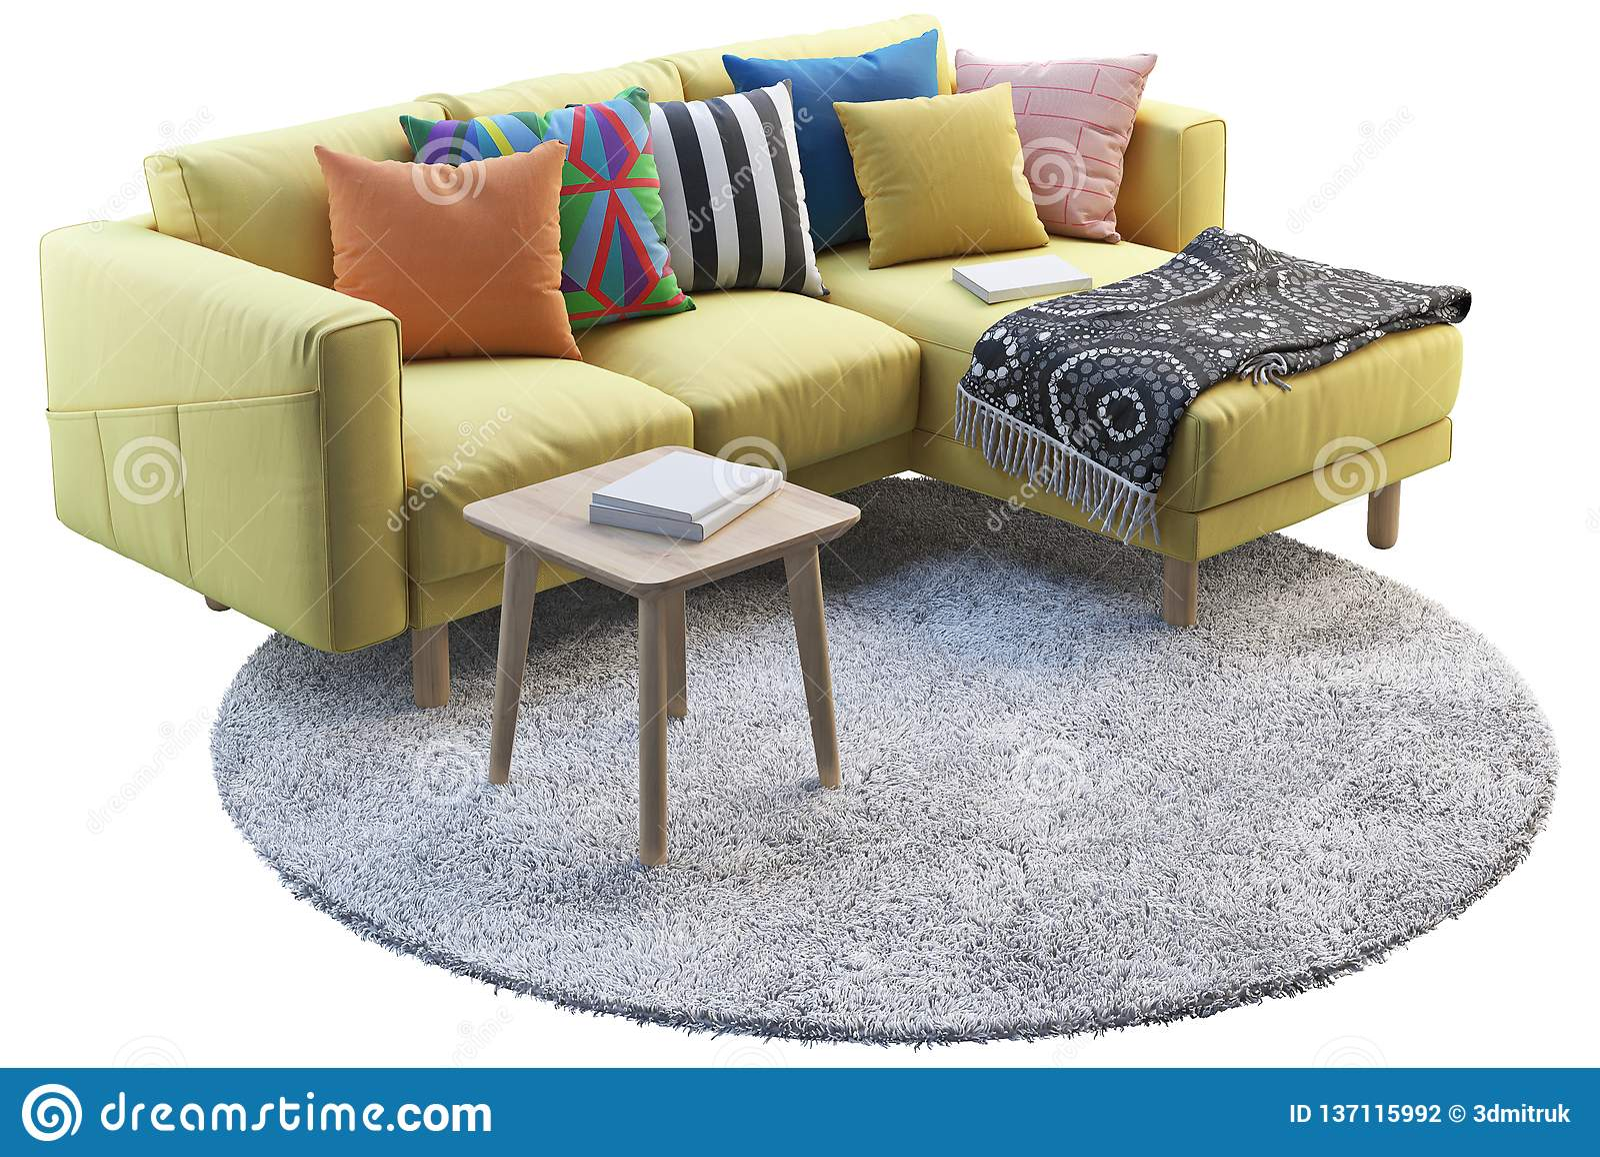 Remarkable Yellow Fabric Sofa With Gray Rug And Wooden Coffee Table 3D Inzonedesignstudio Interior Chair Design Inzonedesignstudiocom